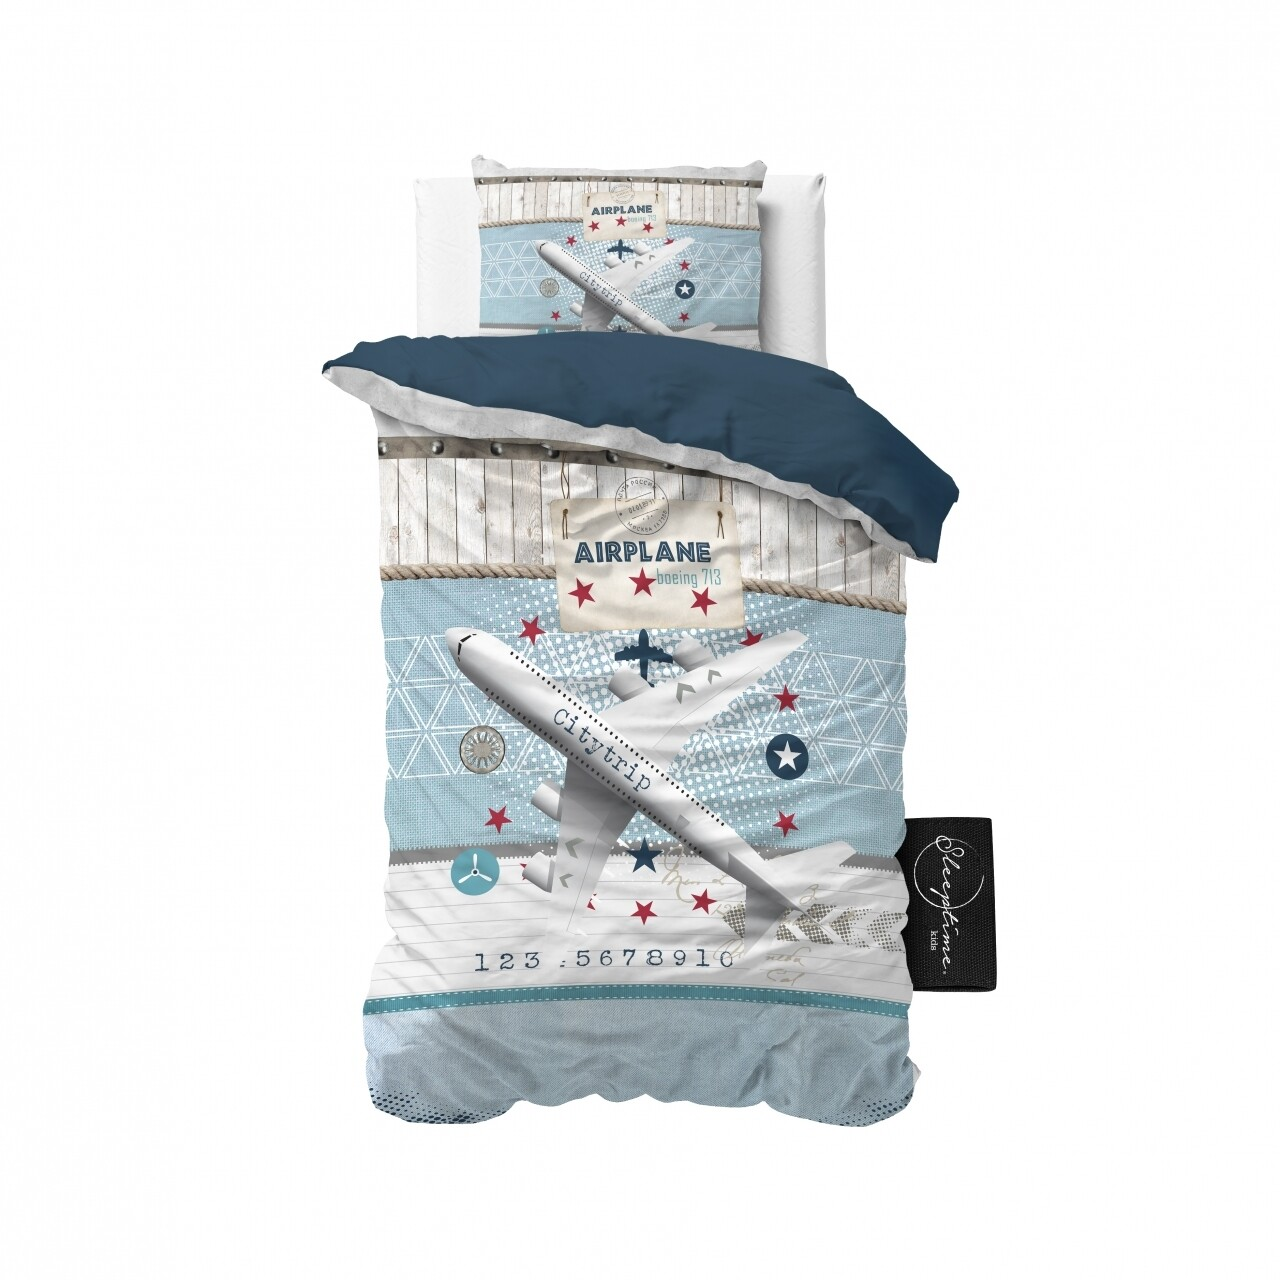 Lenjerie de pat pentru o persoana, Airplane 713 Blue, Royal Textile, 2 piese, 140 x 200 cm, 100% bumbac, multicolora